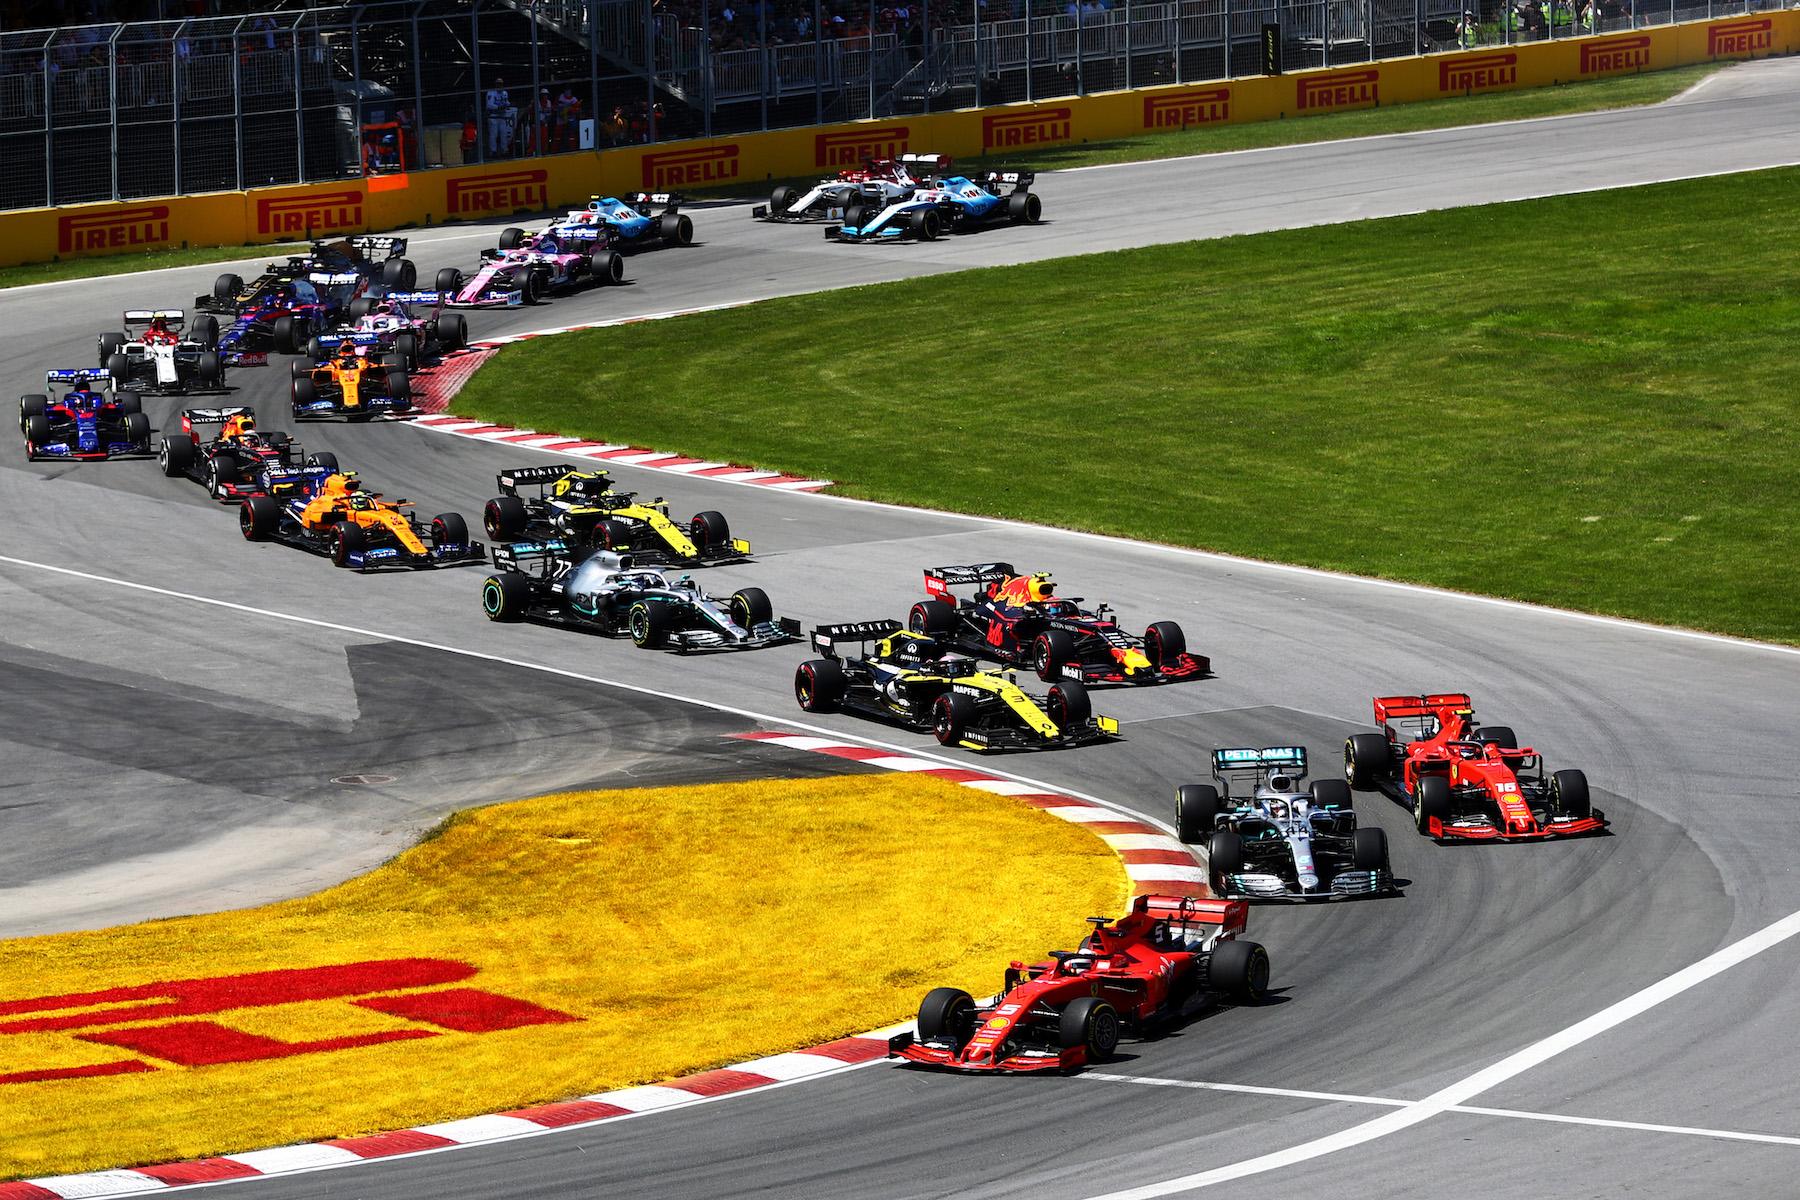 4 2019 Canadian GP 35.jpg